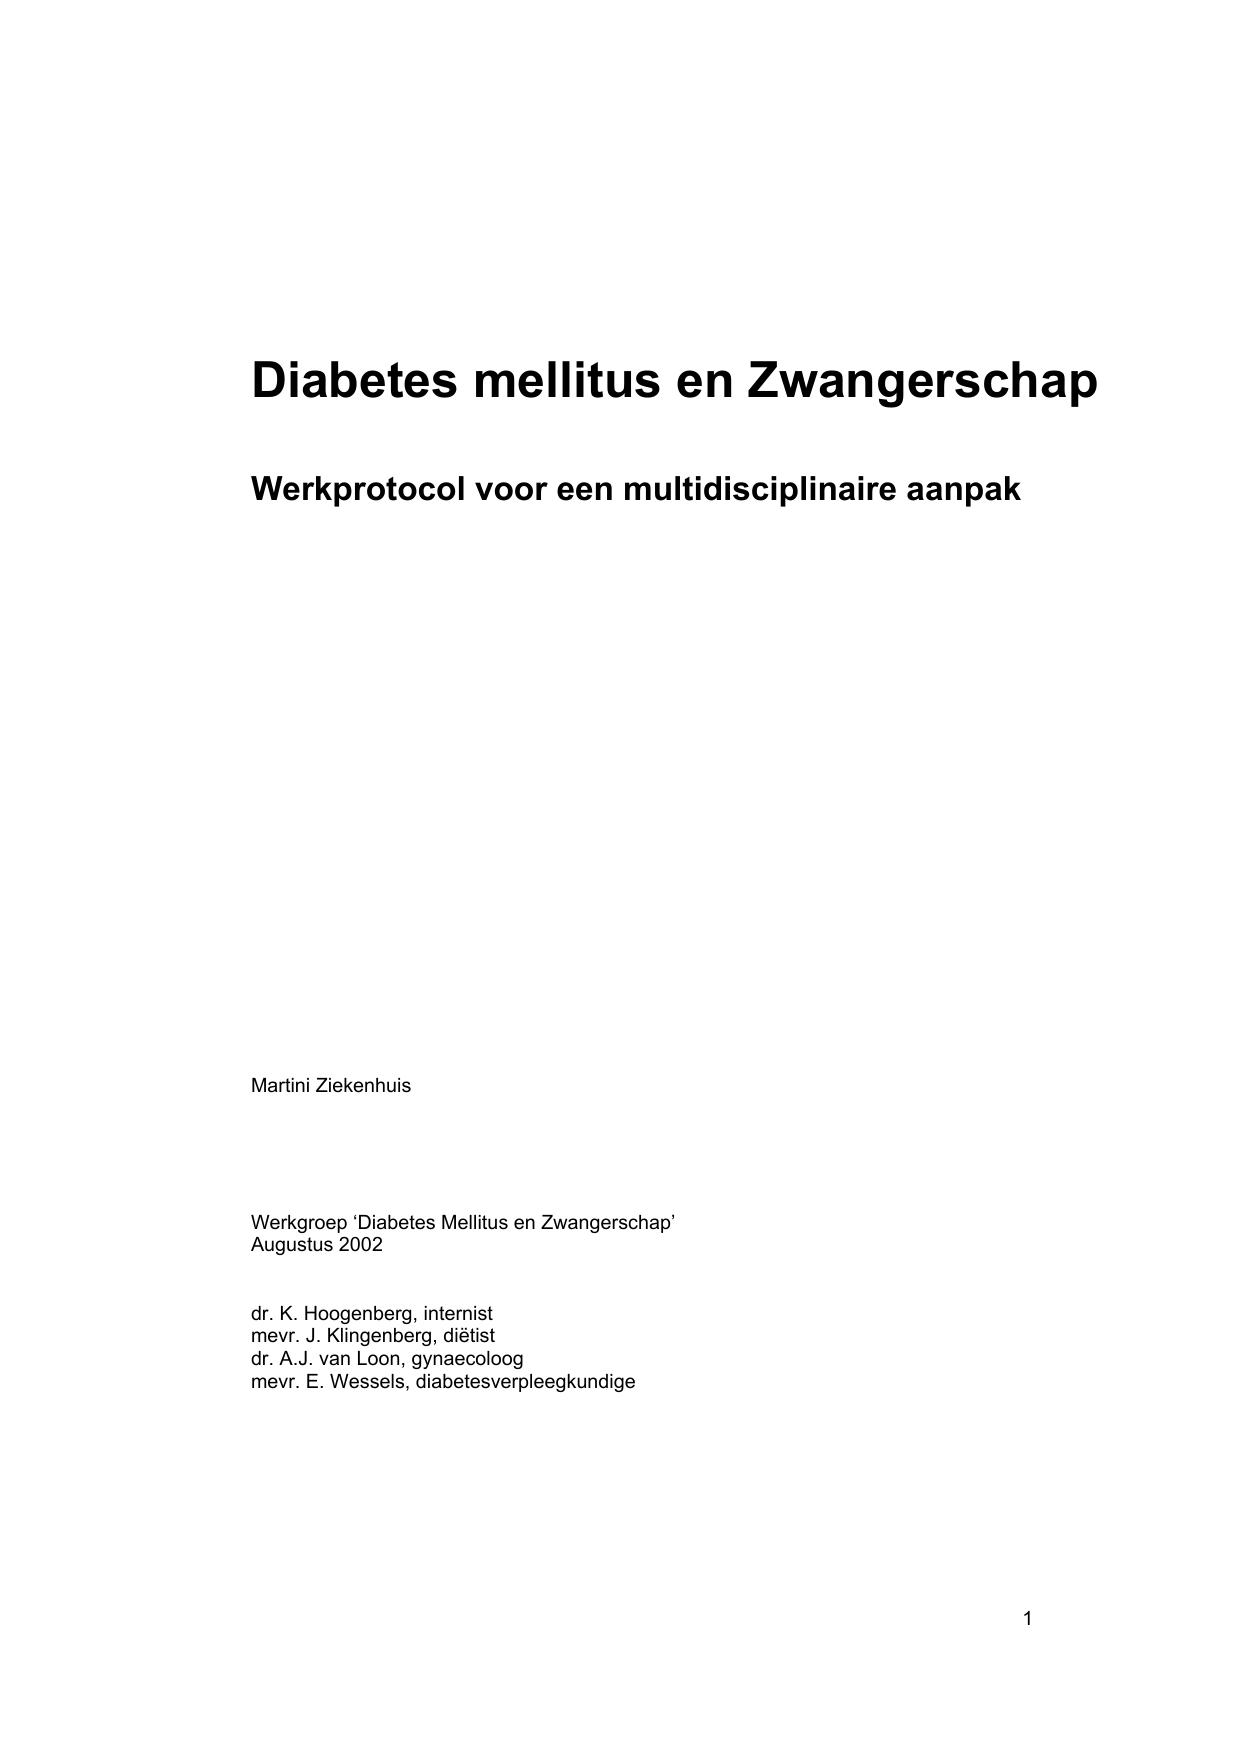 schildklierontsteking en zwangerschapsdiabetes